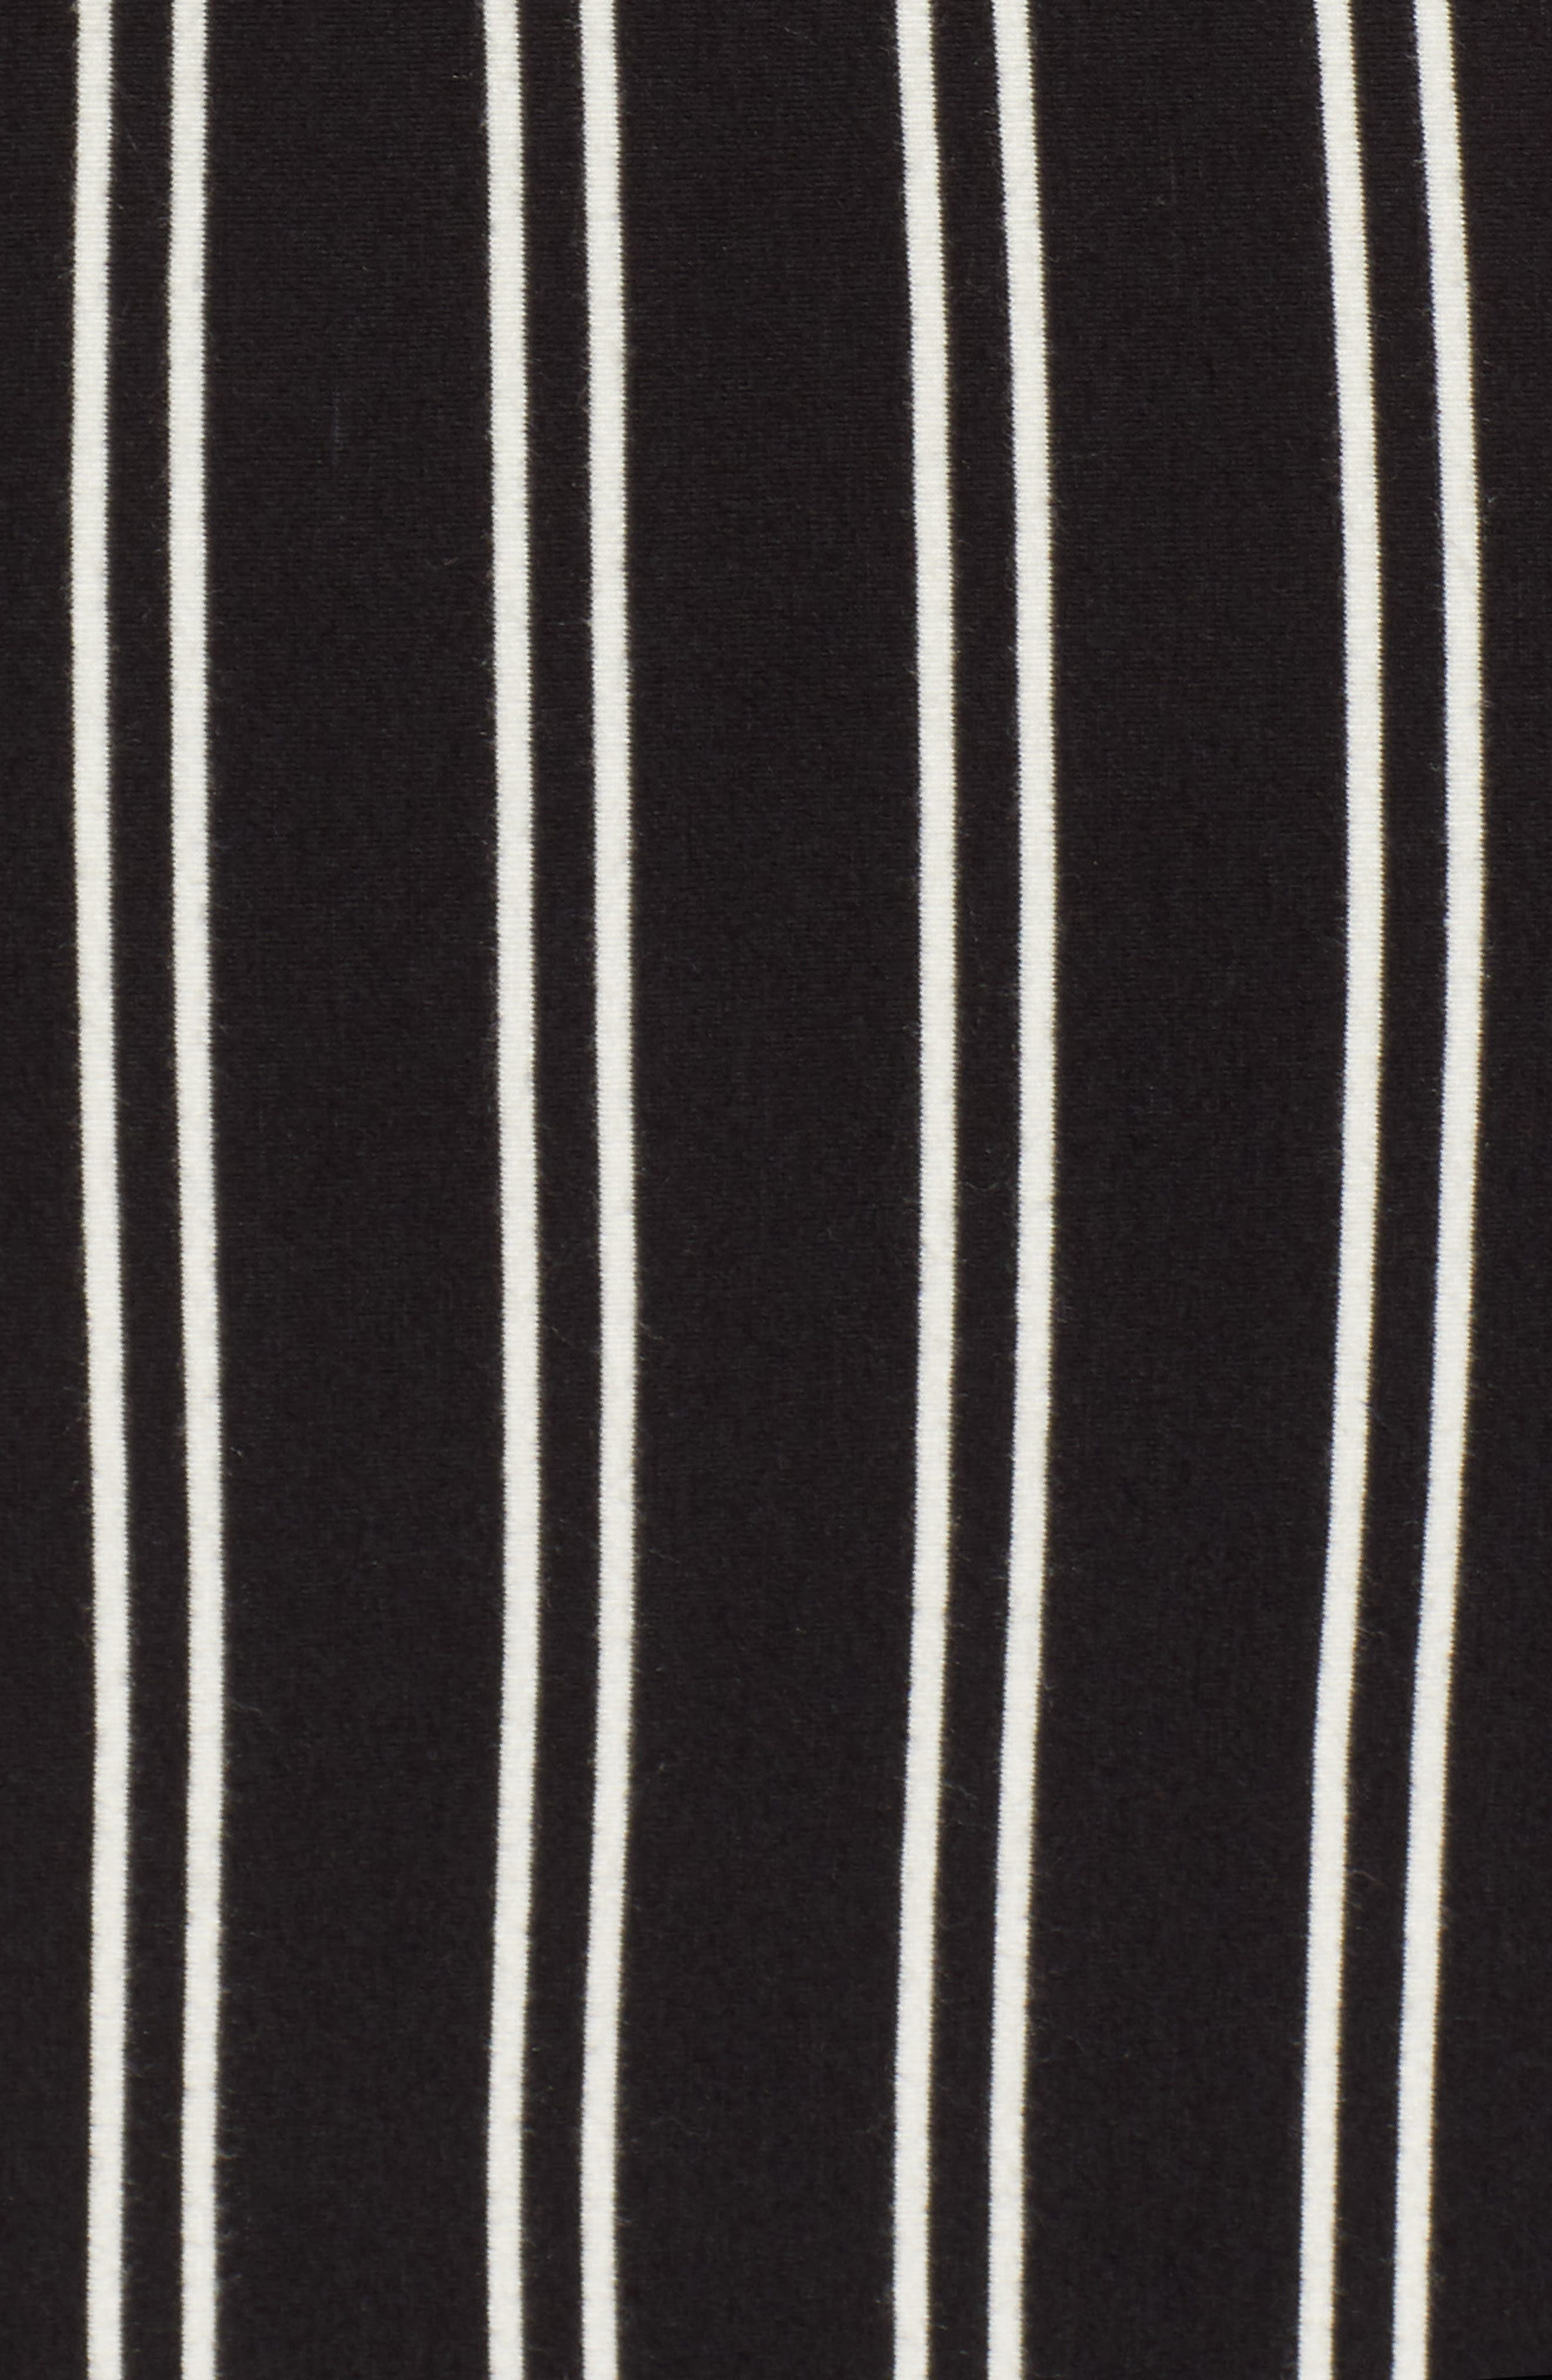 Lockette Strappy Striped Dress,                             Alternate thumbnail 6, color,                             005